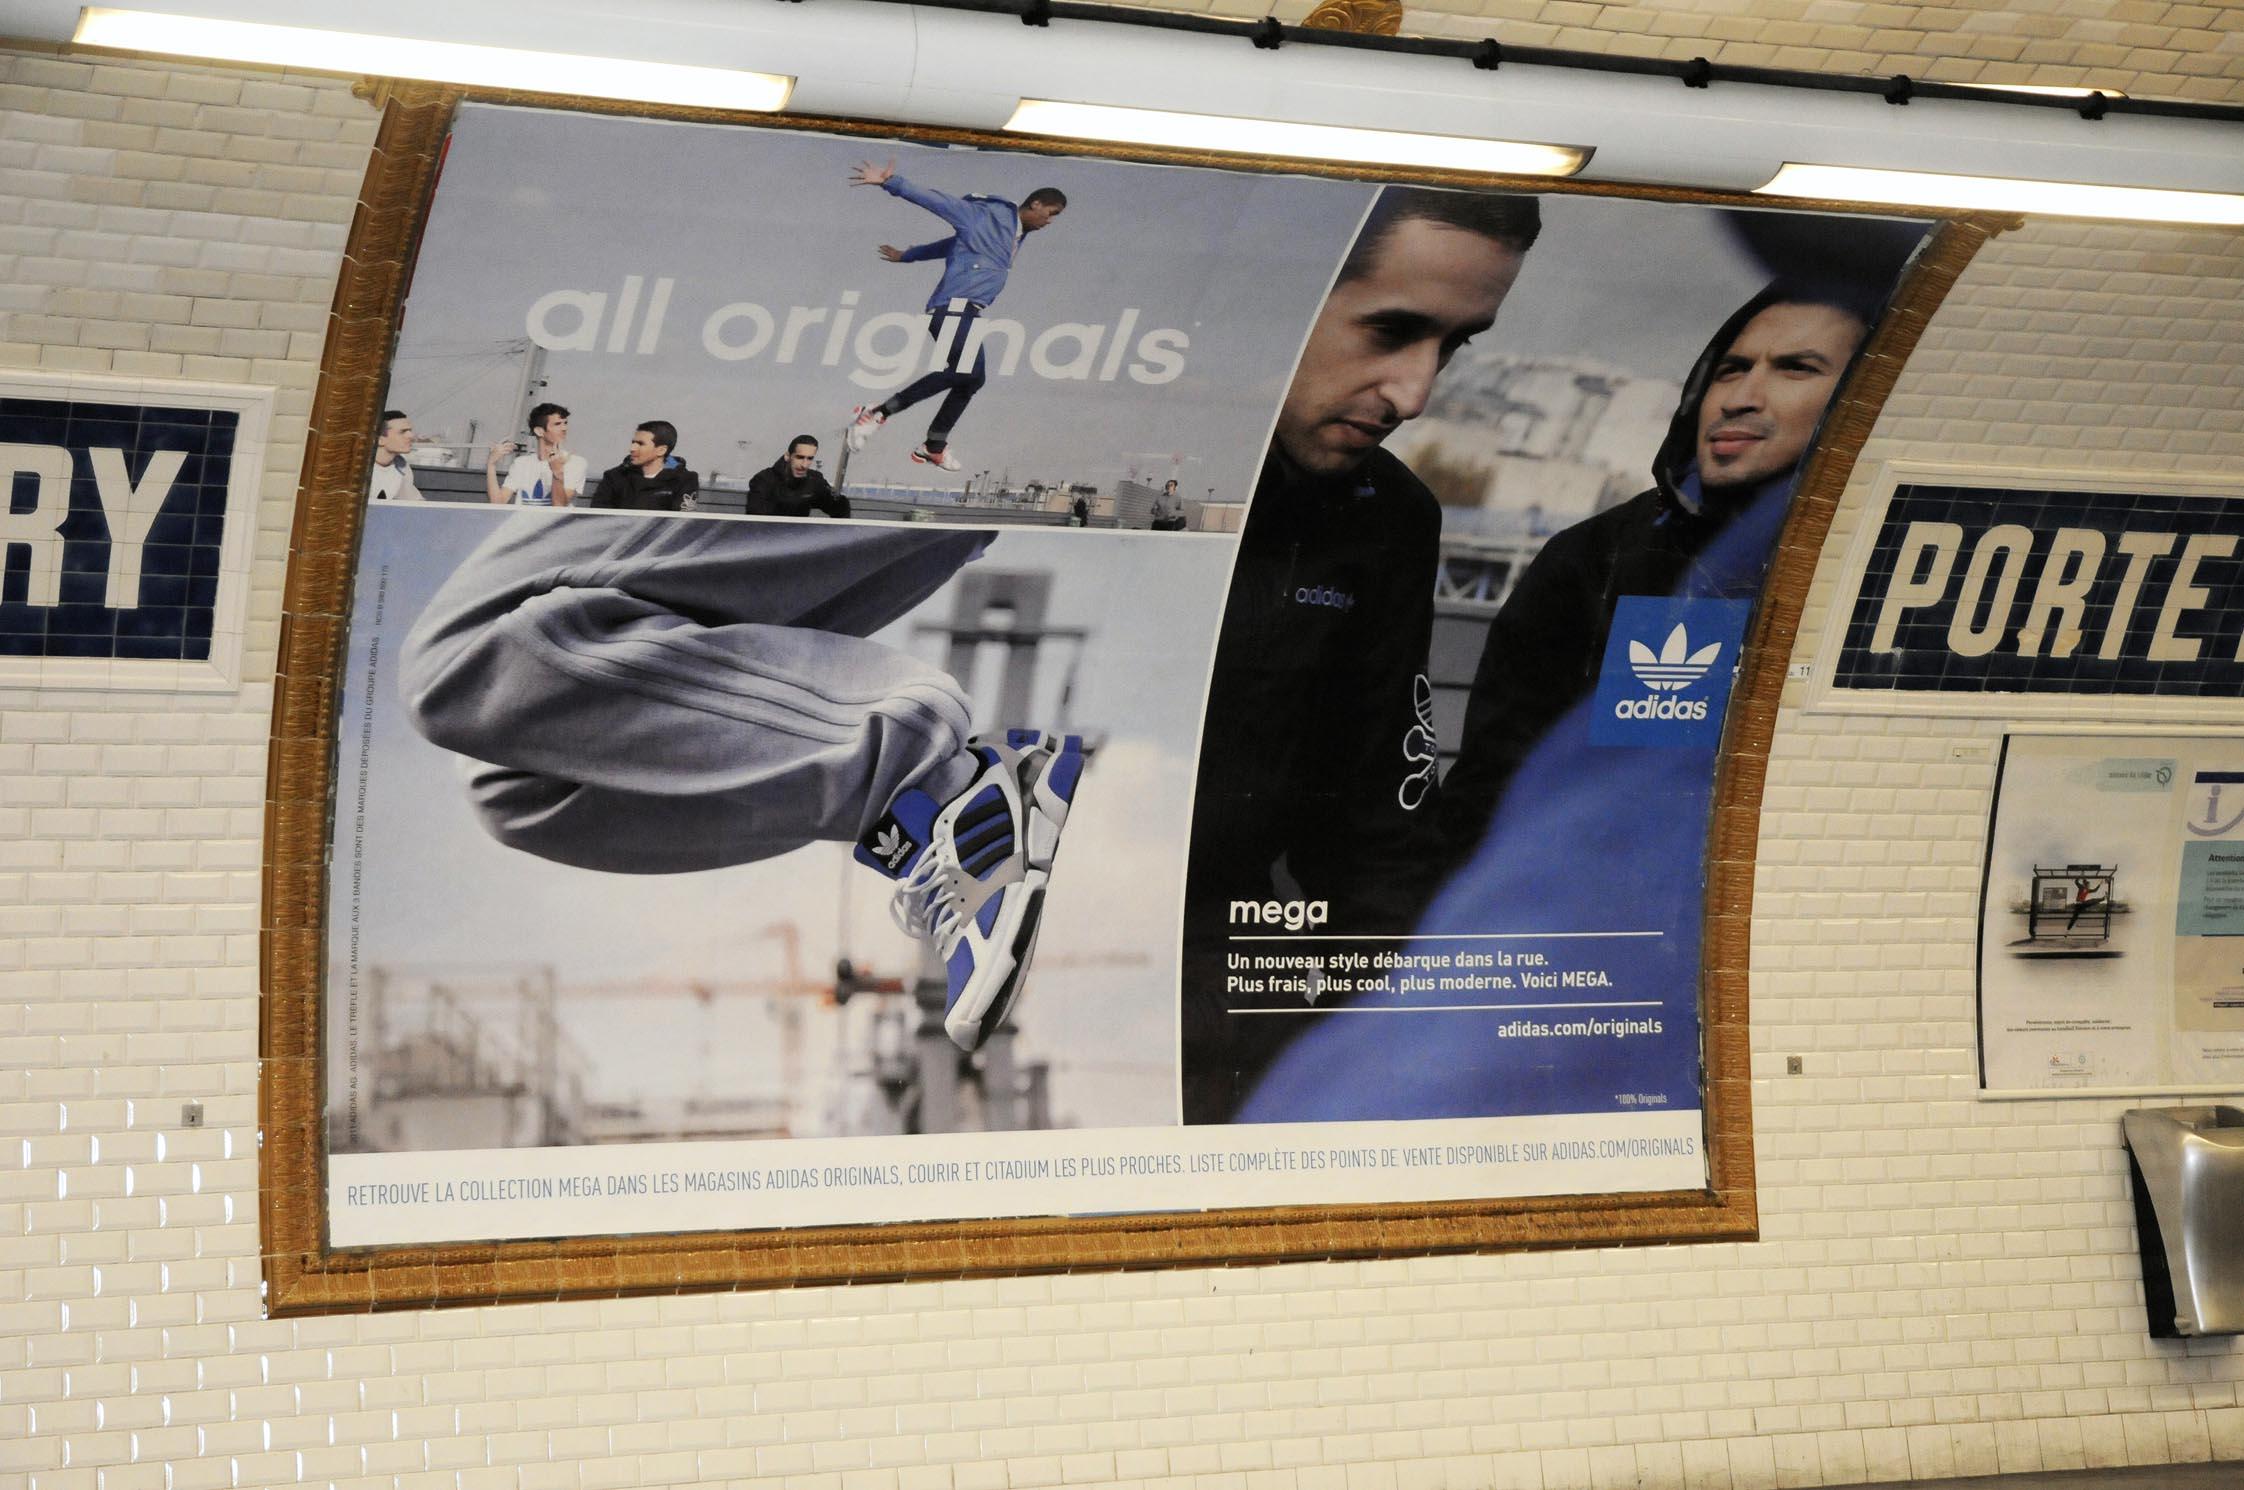 Magasin Adidas Plan De Campagne Nouveau Stock Adidas Skeuds